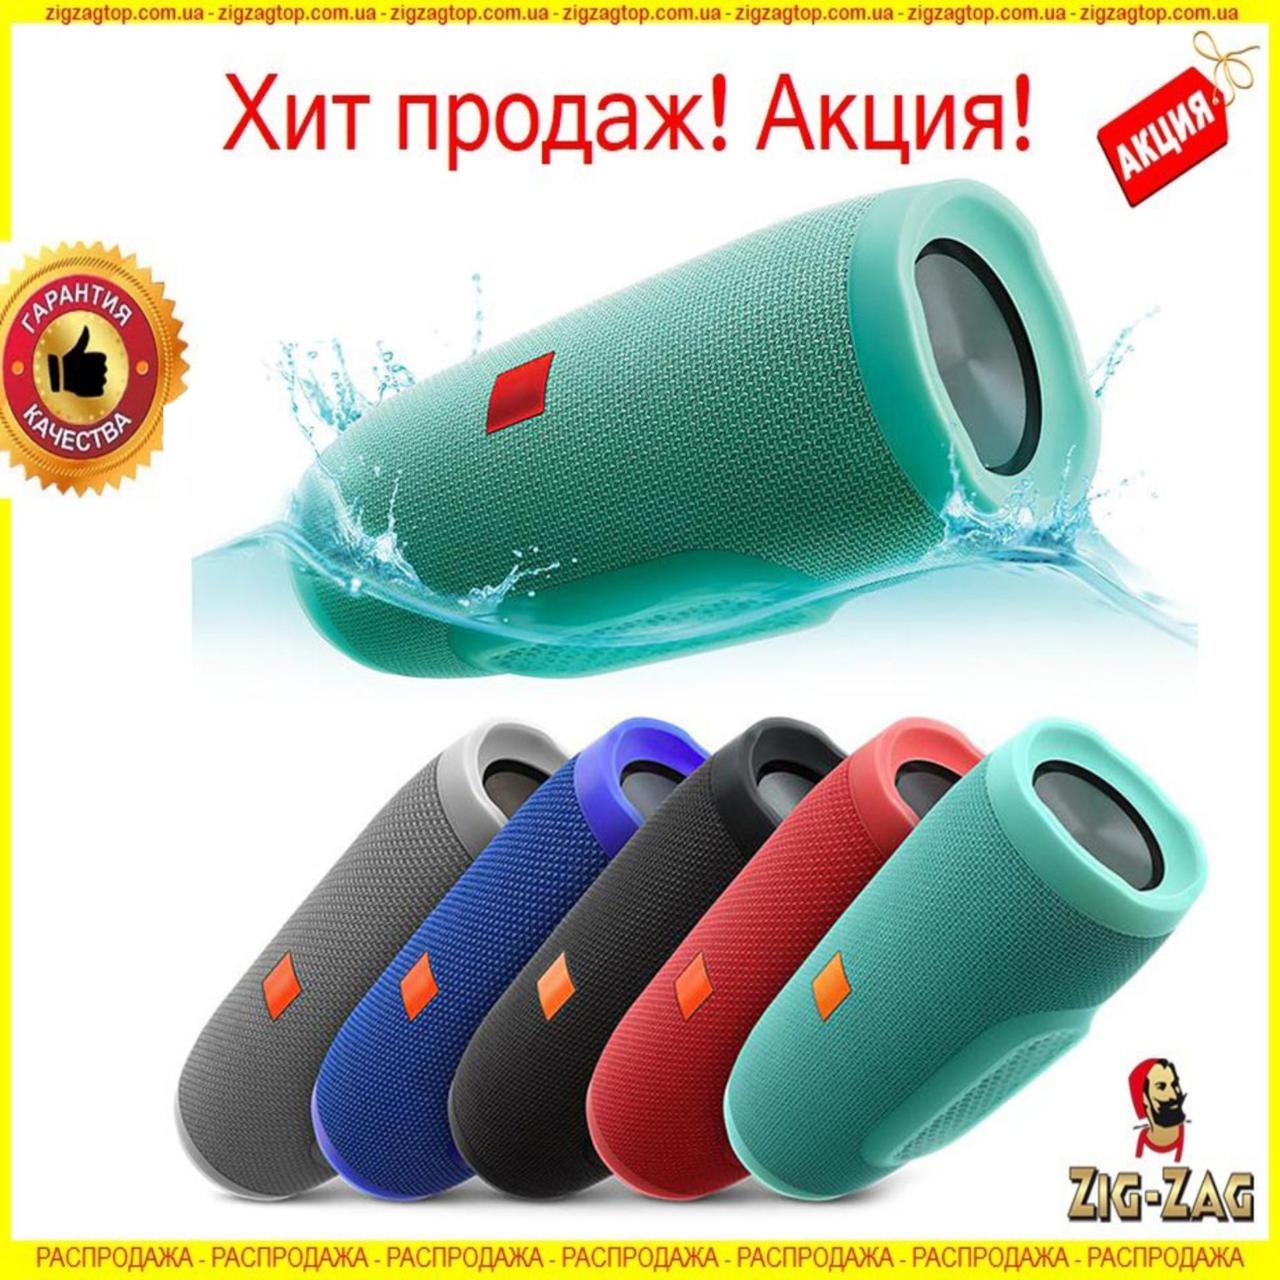 Портативна колонка JBL Charge 3 20ВАТ Bluetooth FM Джбл Чарч 6000mAh PowerBank Блютуз акустика радіо NEW!